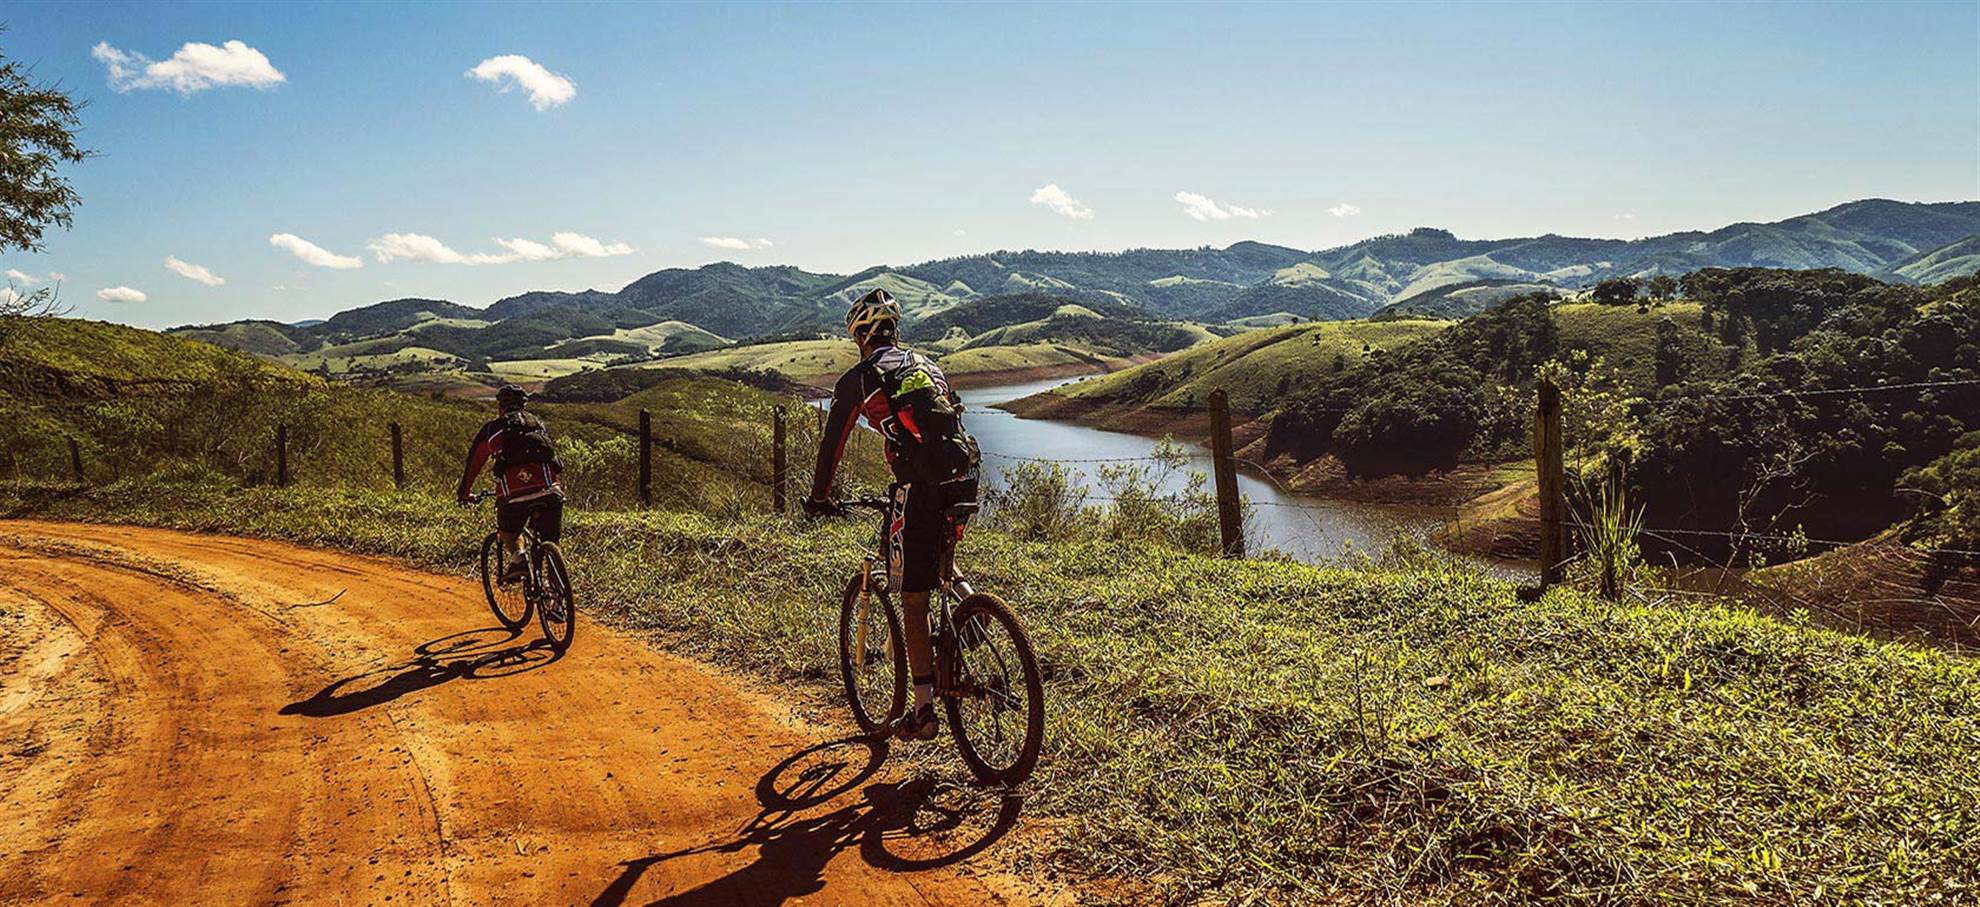 Mountainbiking MTB Tour Dehasa de Abajo